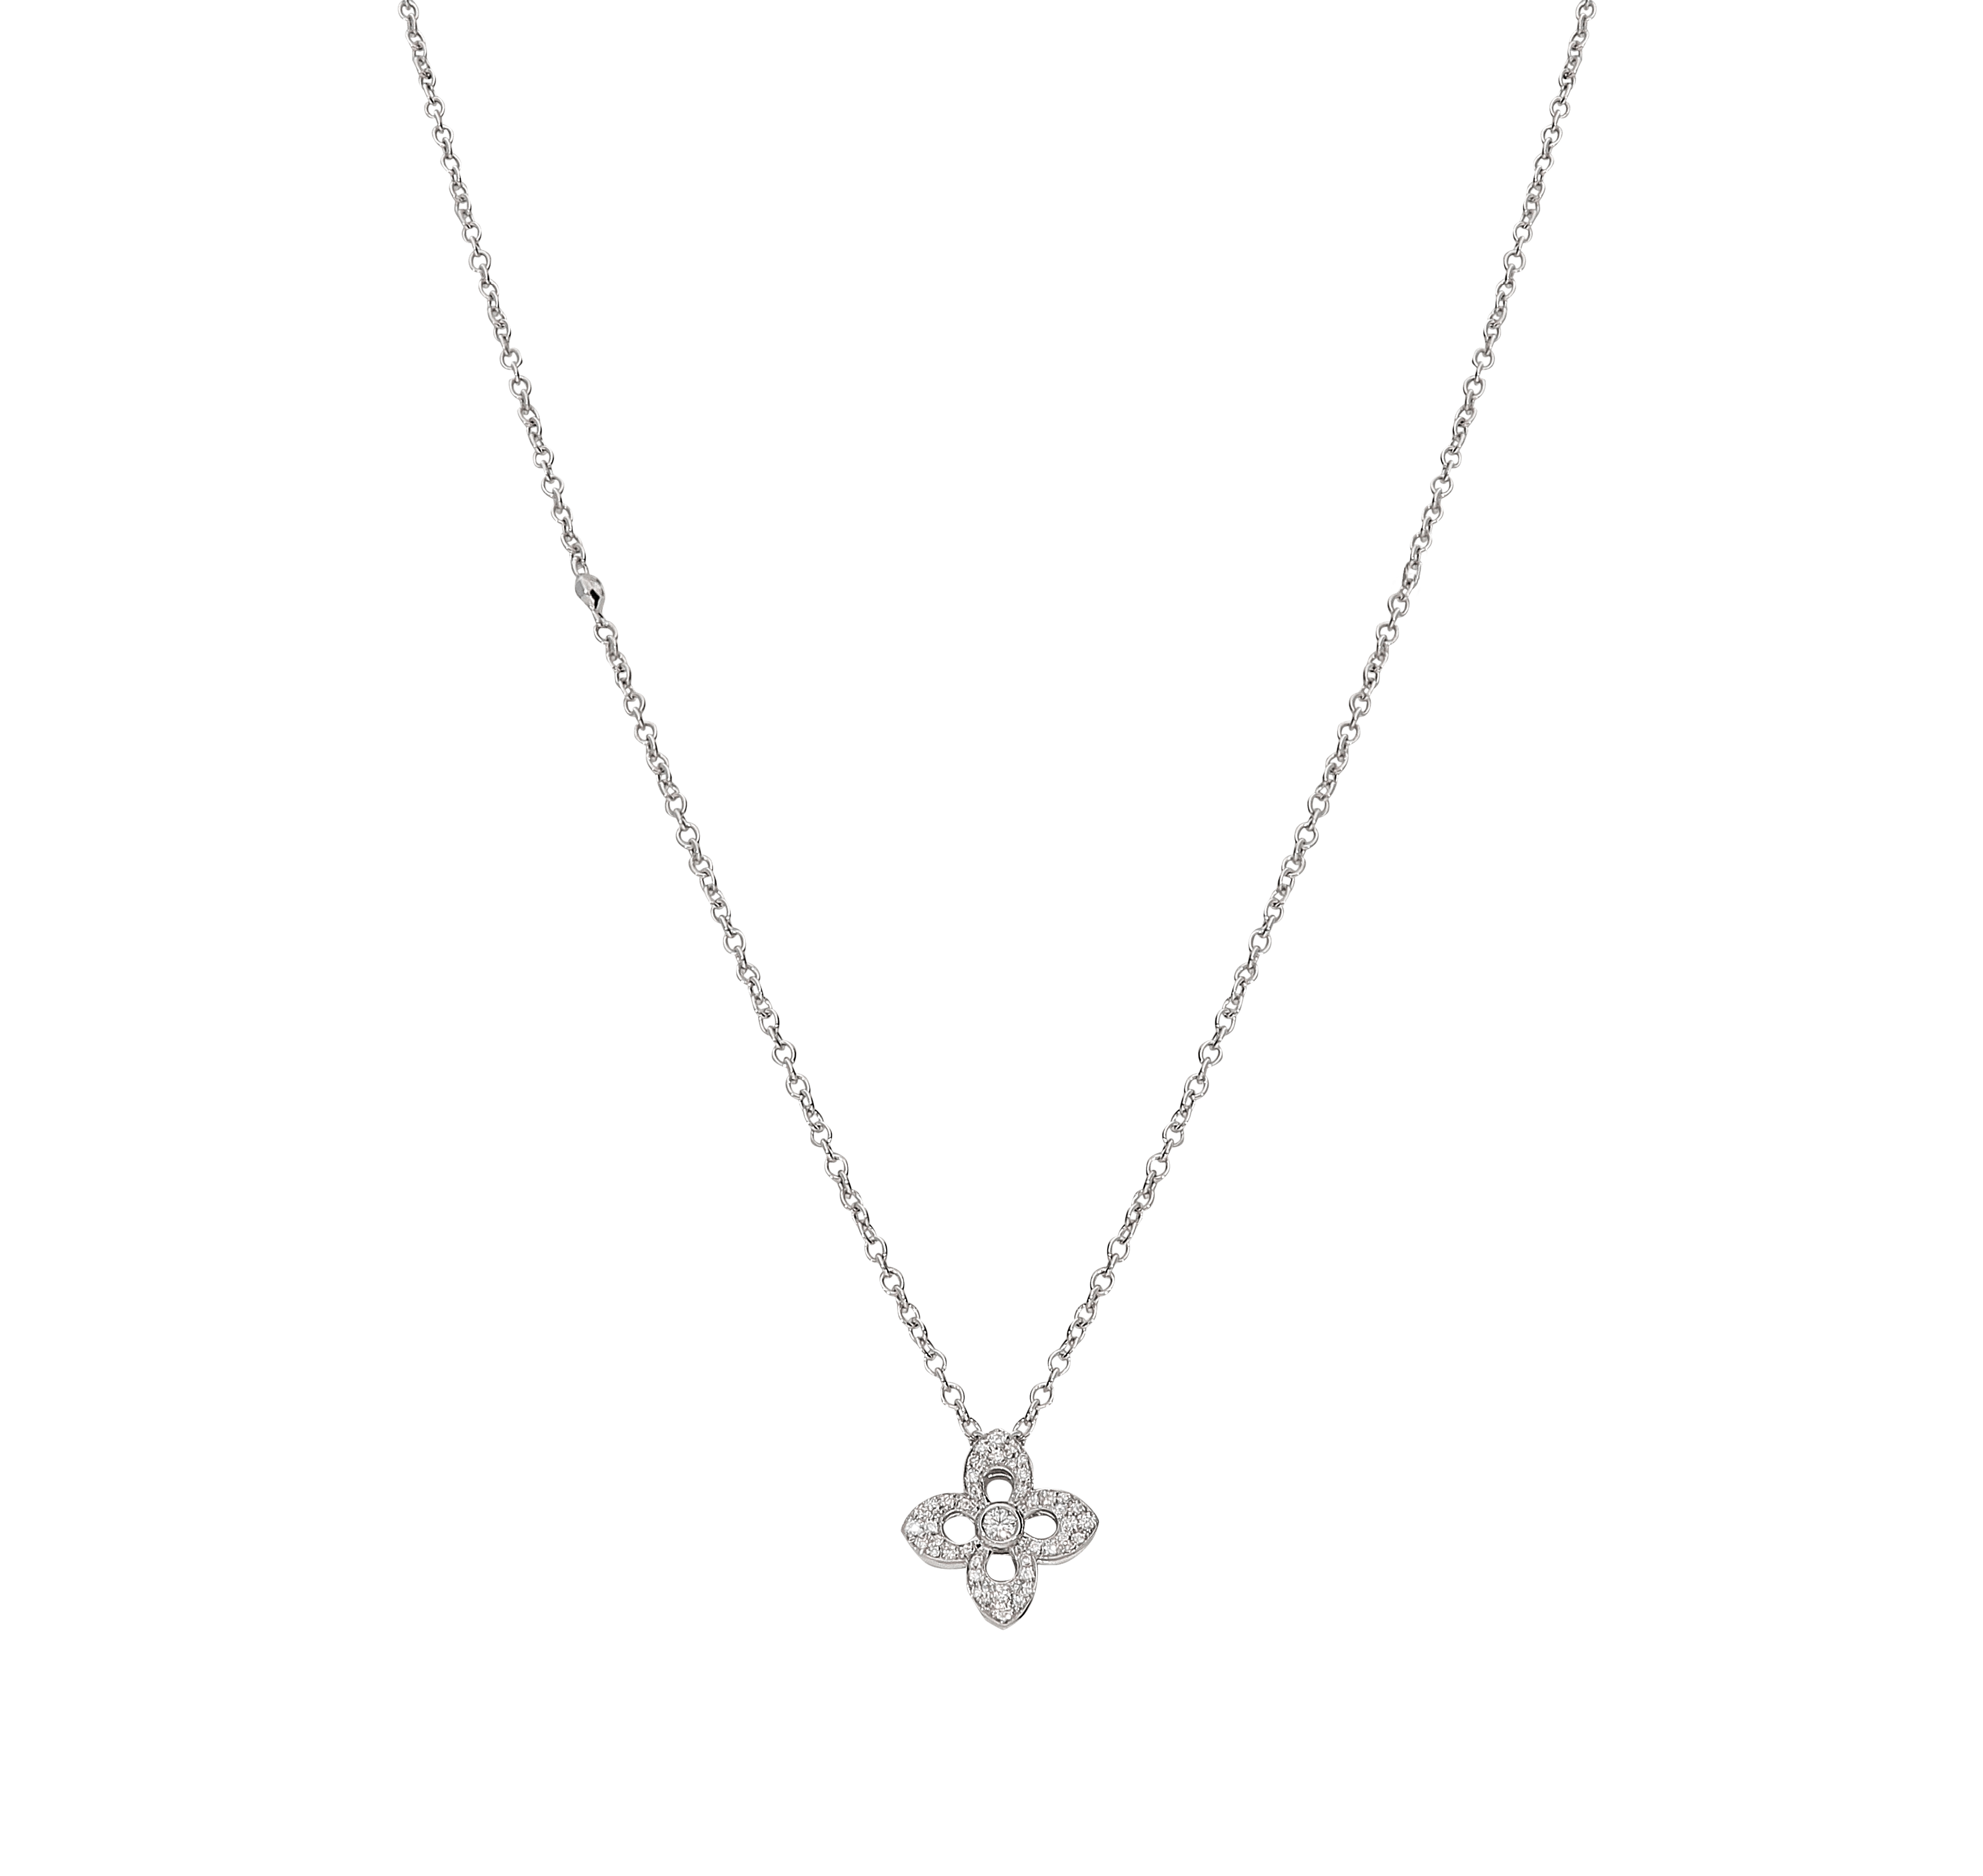 18ct White Gold Pavé Set Diamond Pendant